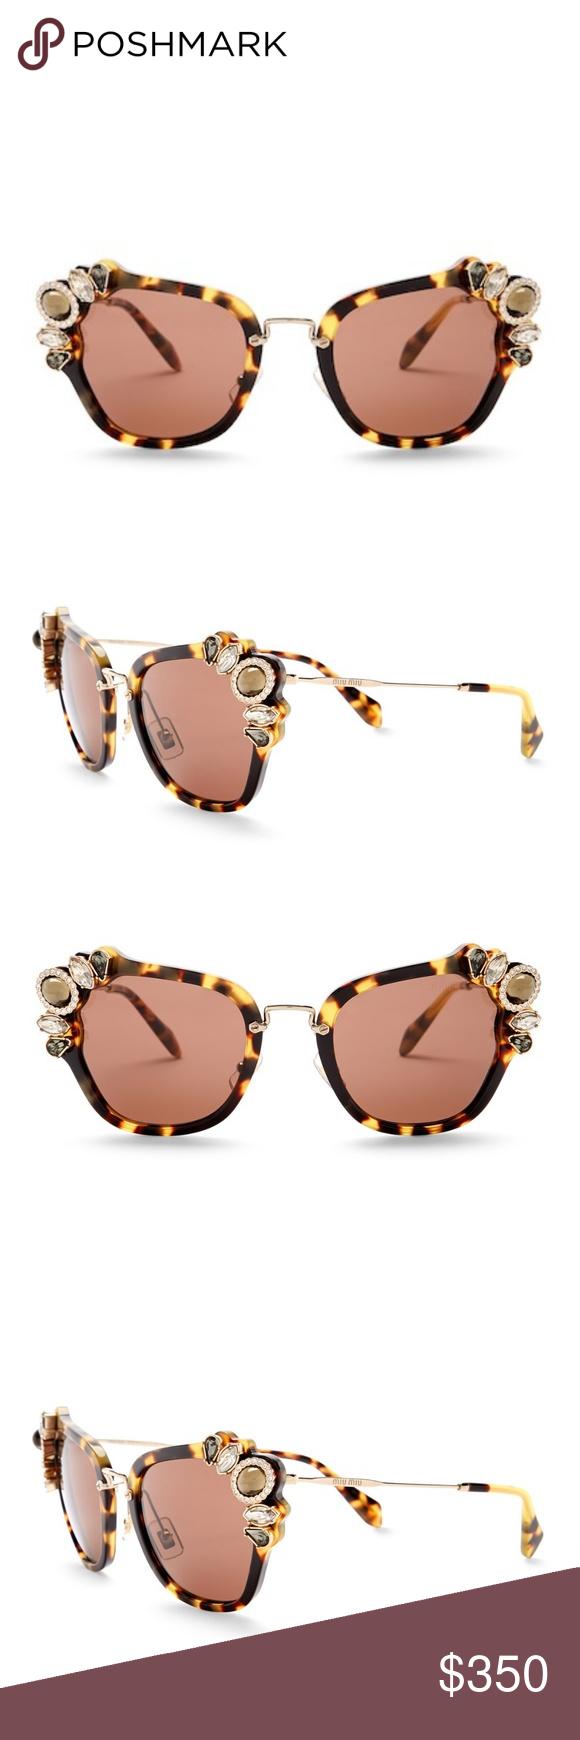 3551d65f93a2 MIU MIU Embellished Crystal Cat Eye Sunglasses NWT